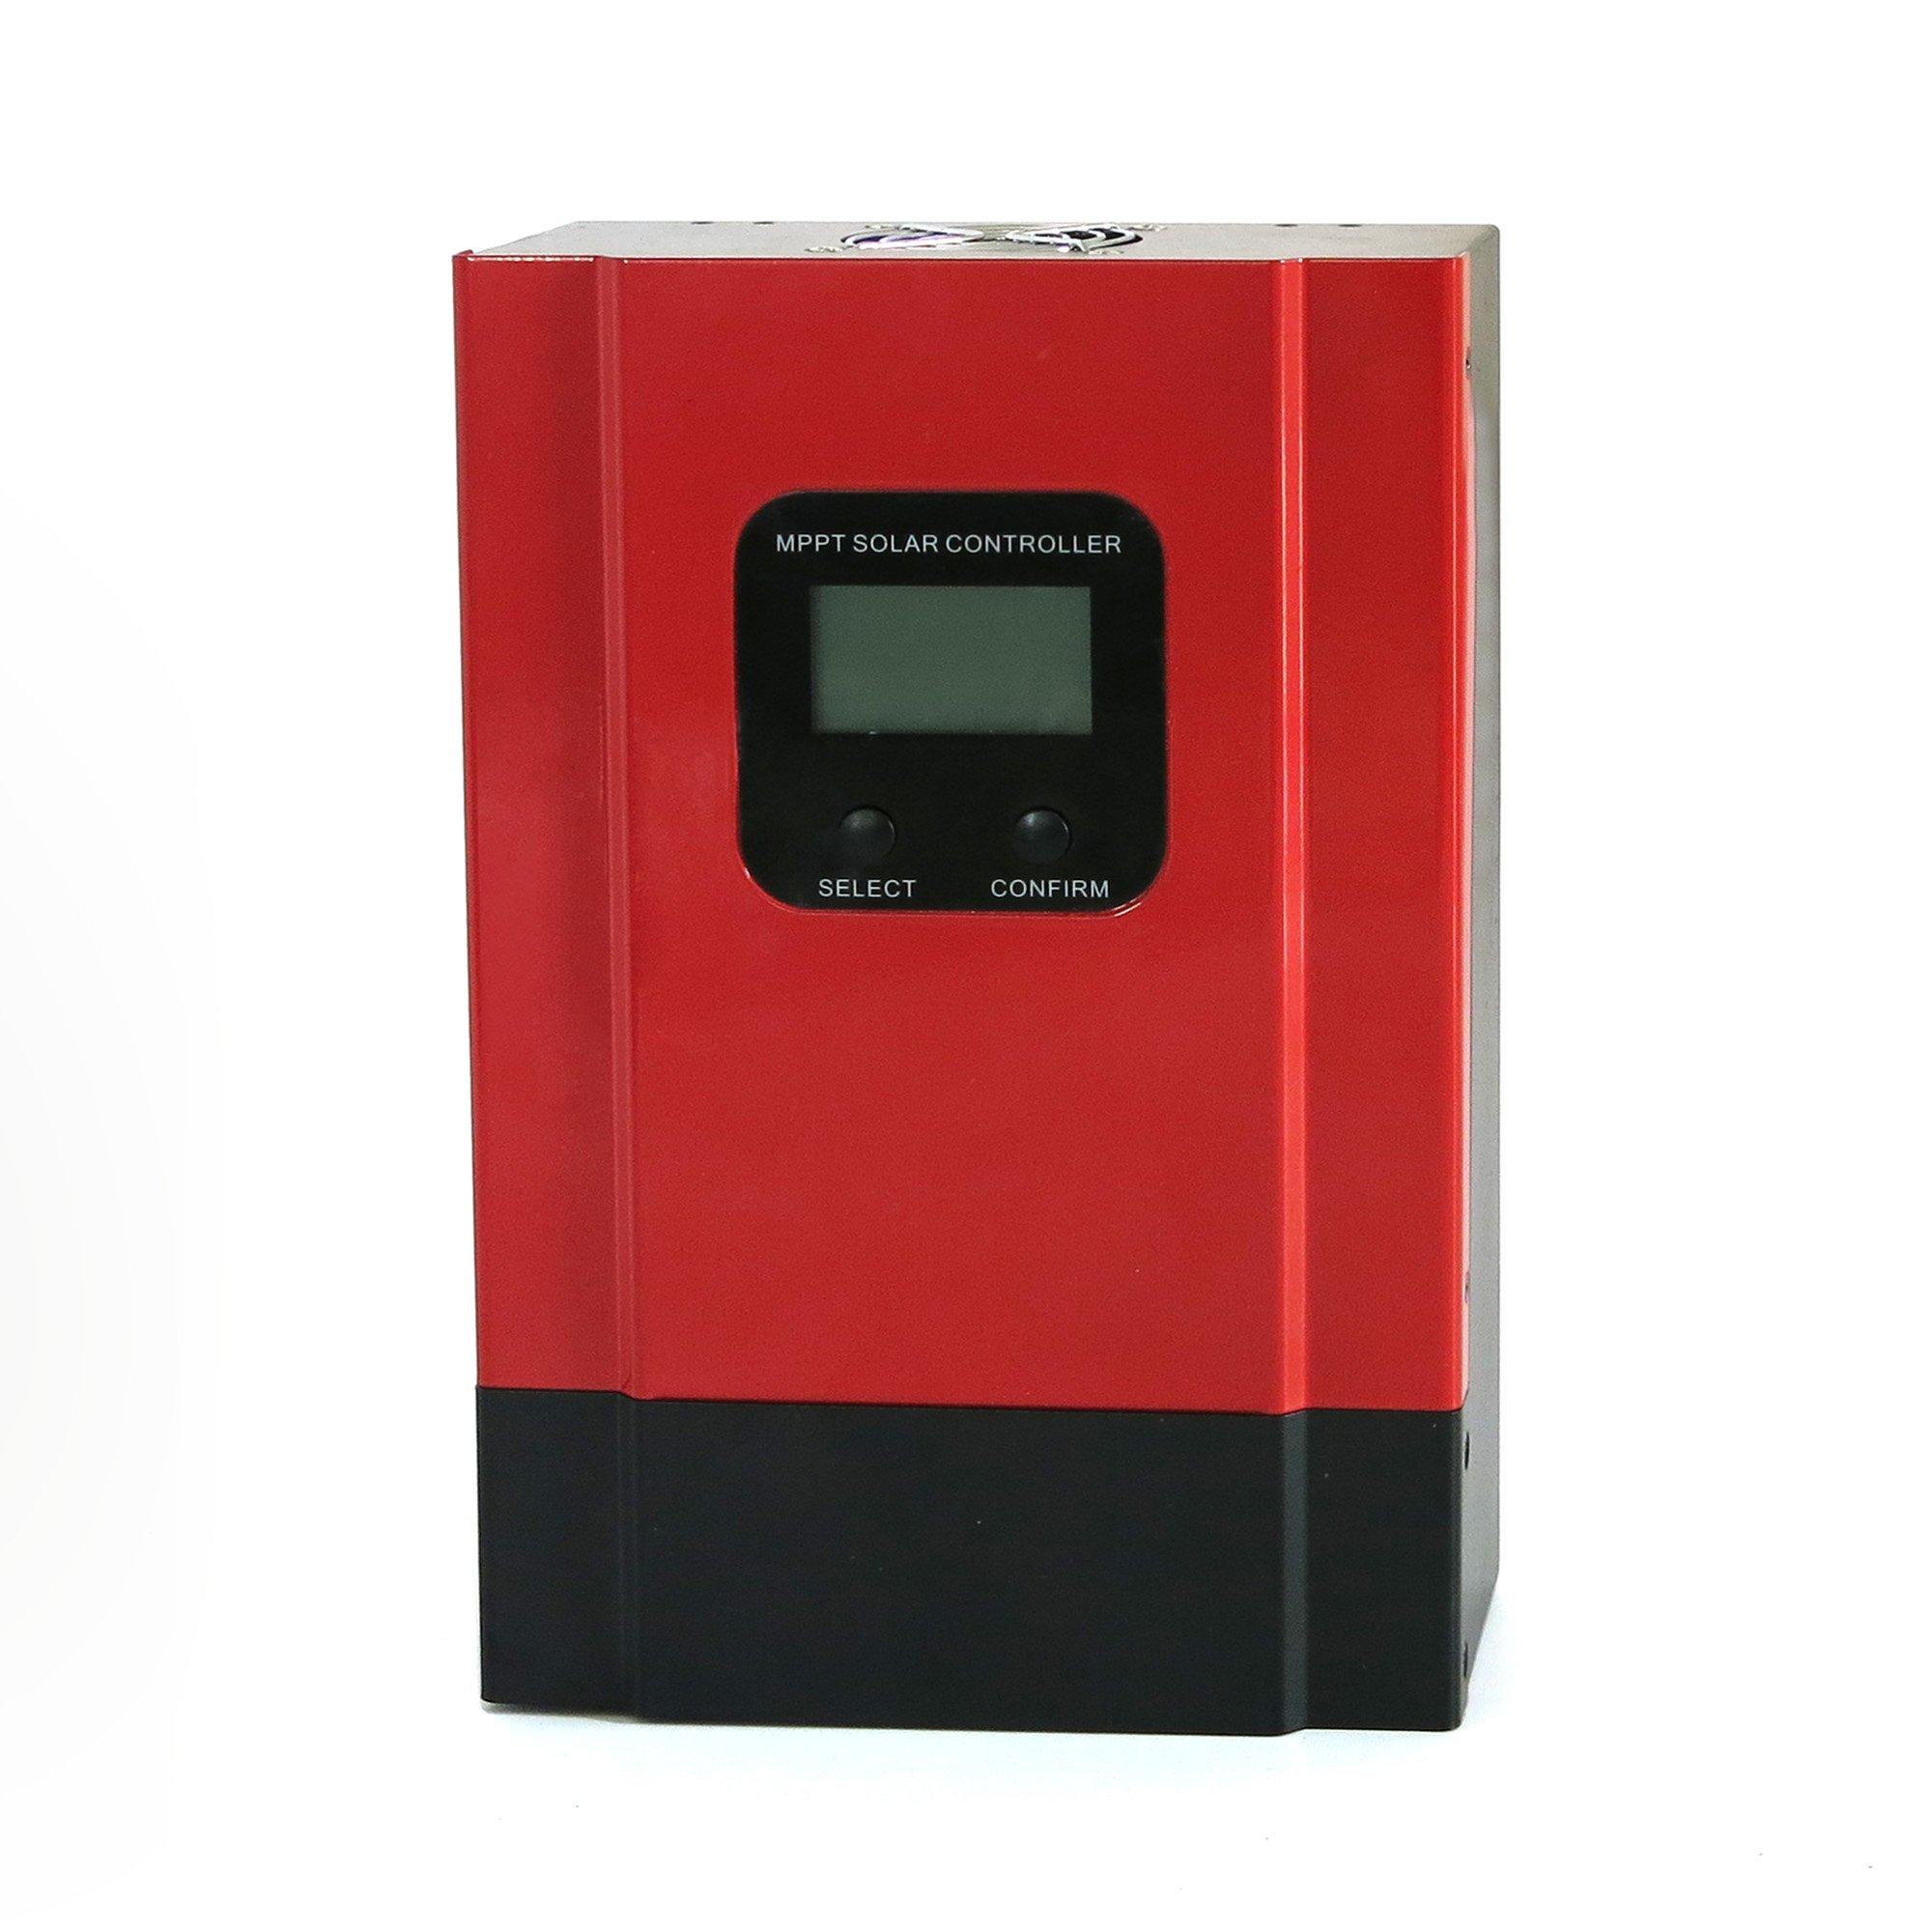 KRXNY 60A MPPT Charge Controller 48V/36V/24V/12V Battery Regulator for Off Grid Solar System Max 150V PV Input by KRXNY